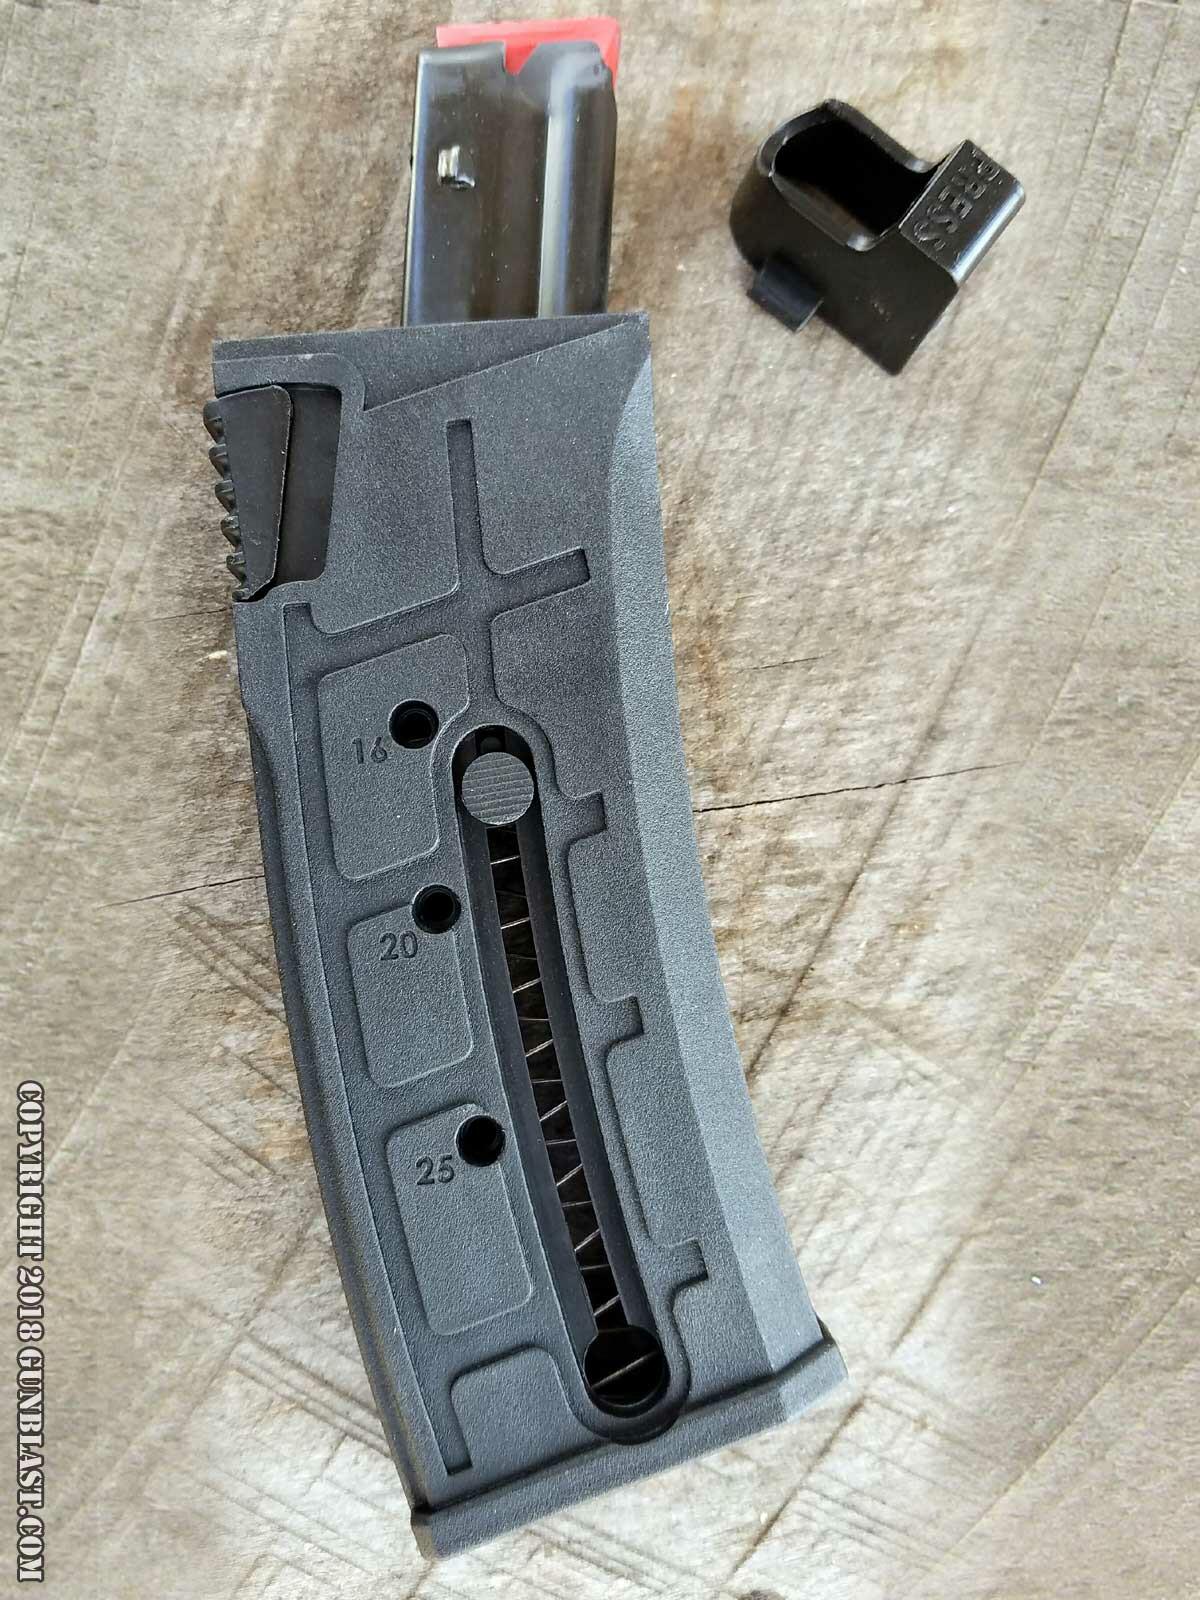 Mossberg 22 Long Rifle Model 702